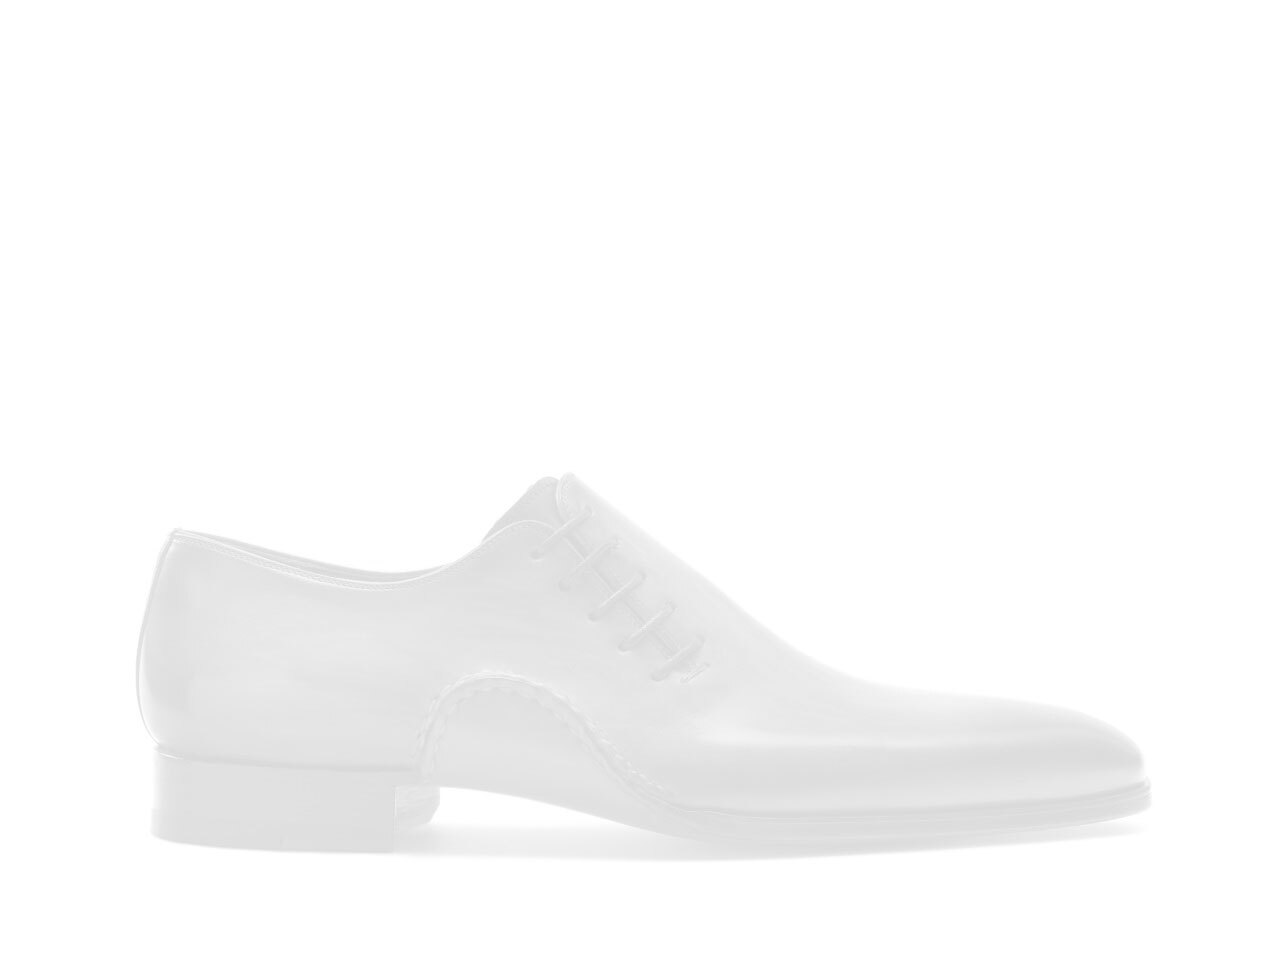 Side view of the Magnanni Saffron Cuero Wide Men's Oxford Shoes